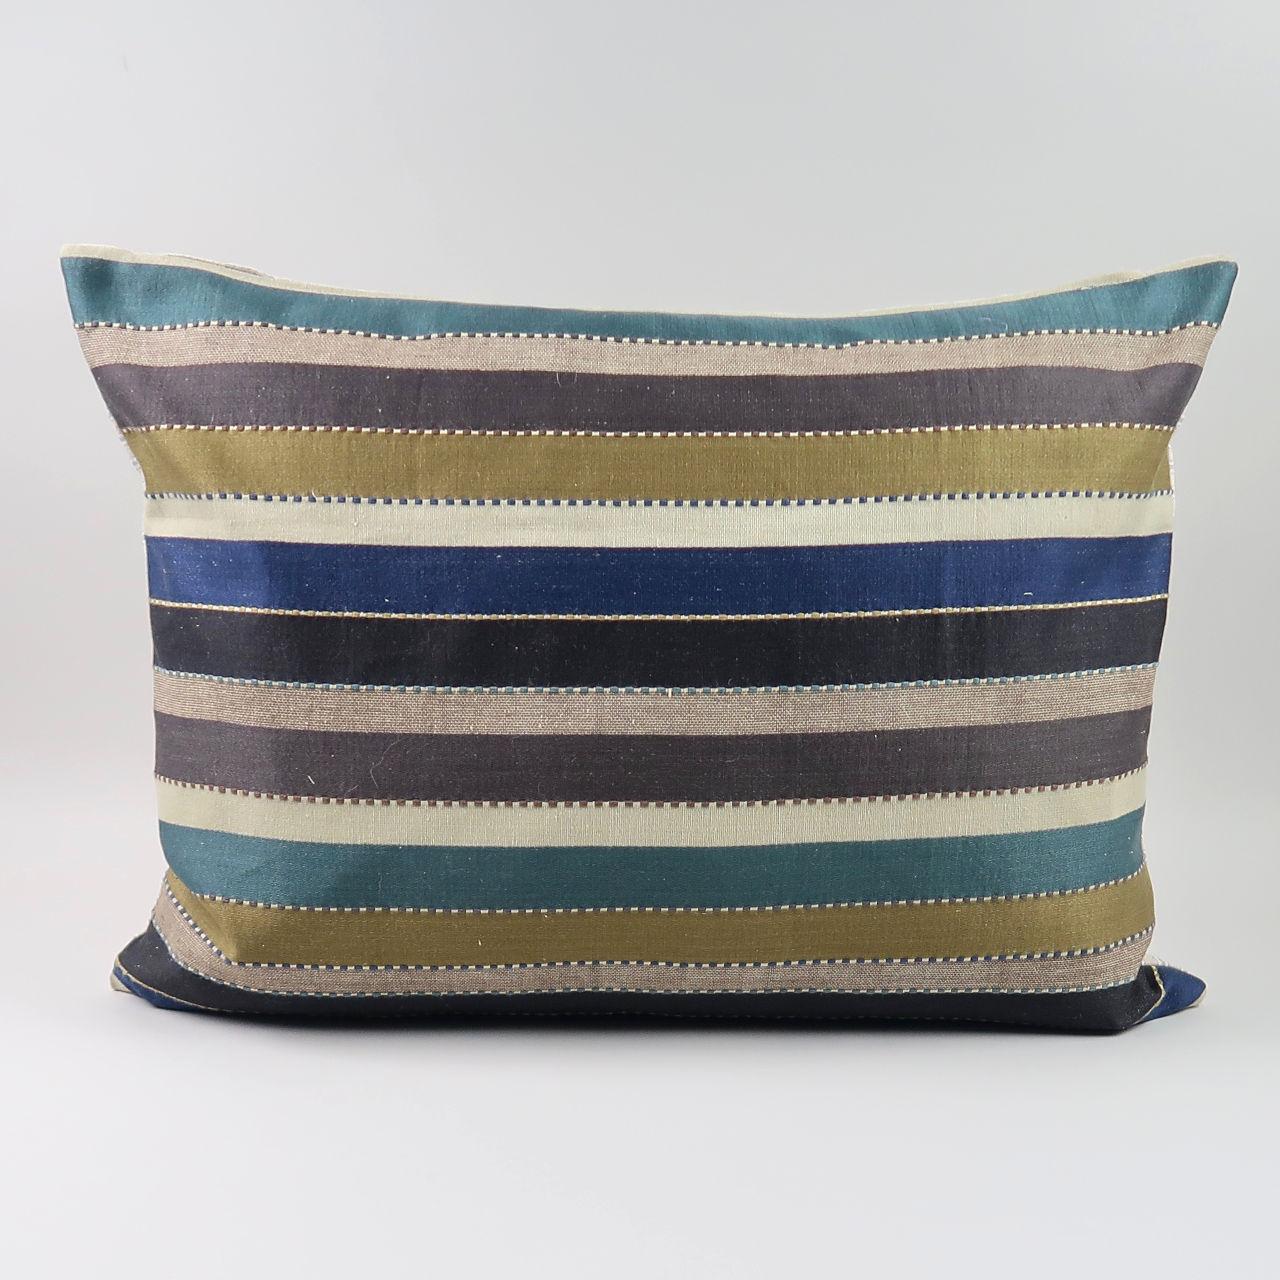 Rectangular cushion in Heavy Stripe Fabric